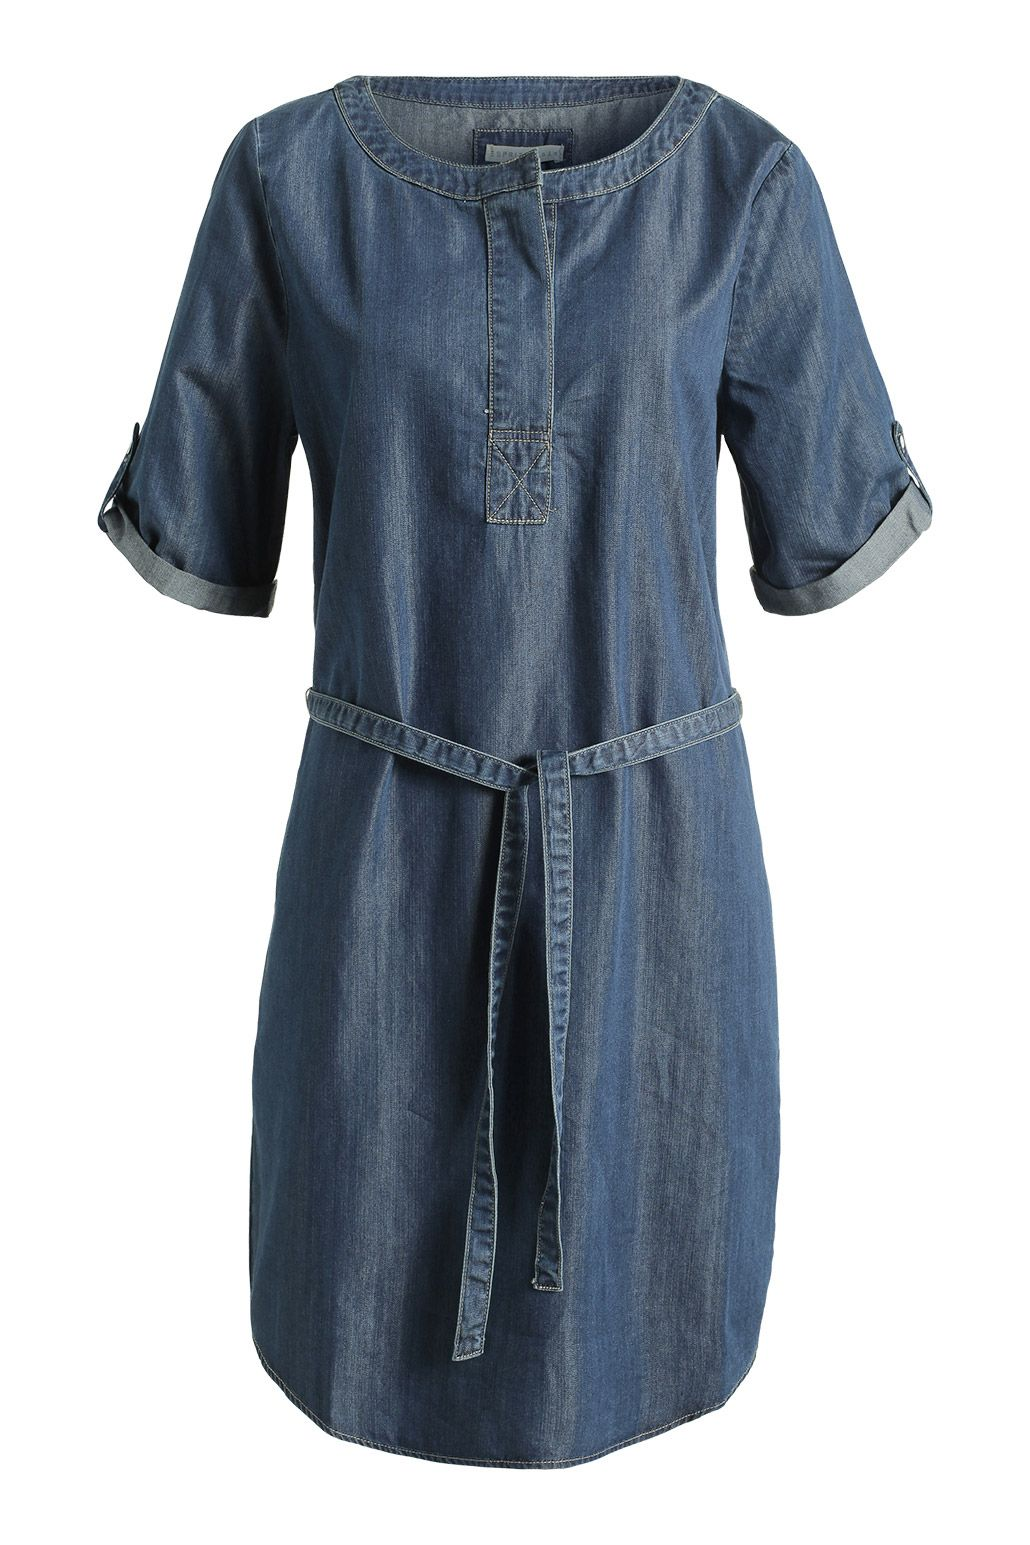 06e1483f82a232 Esprit - Luchtige denim jurk kopen in de online shop